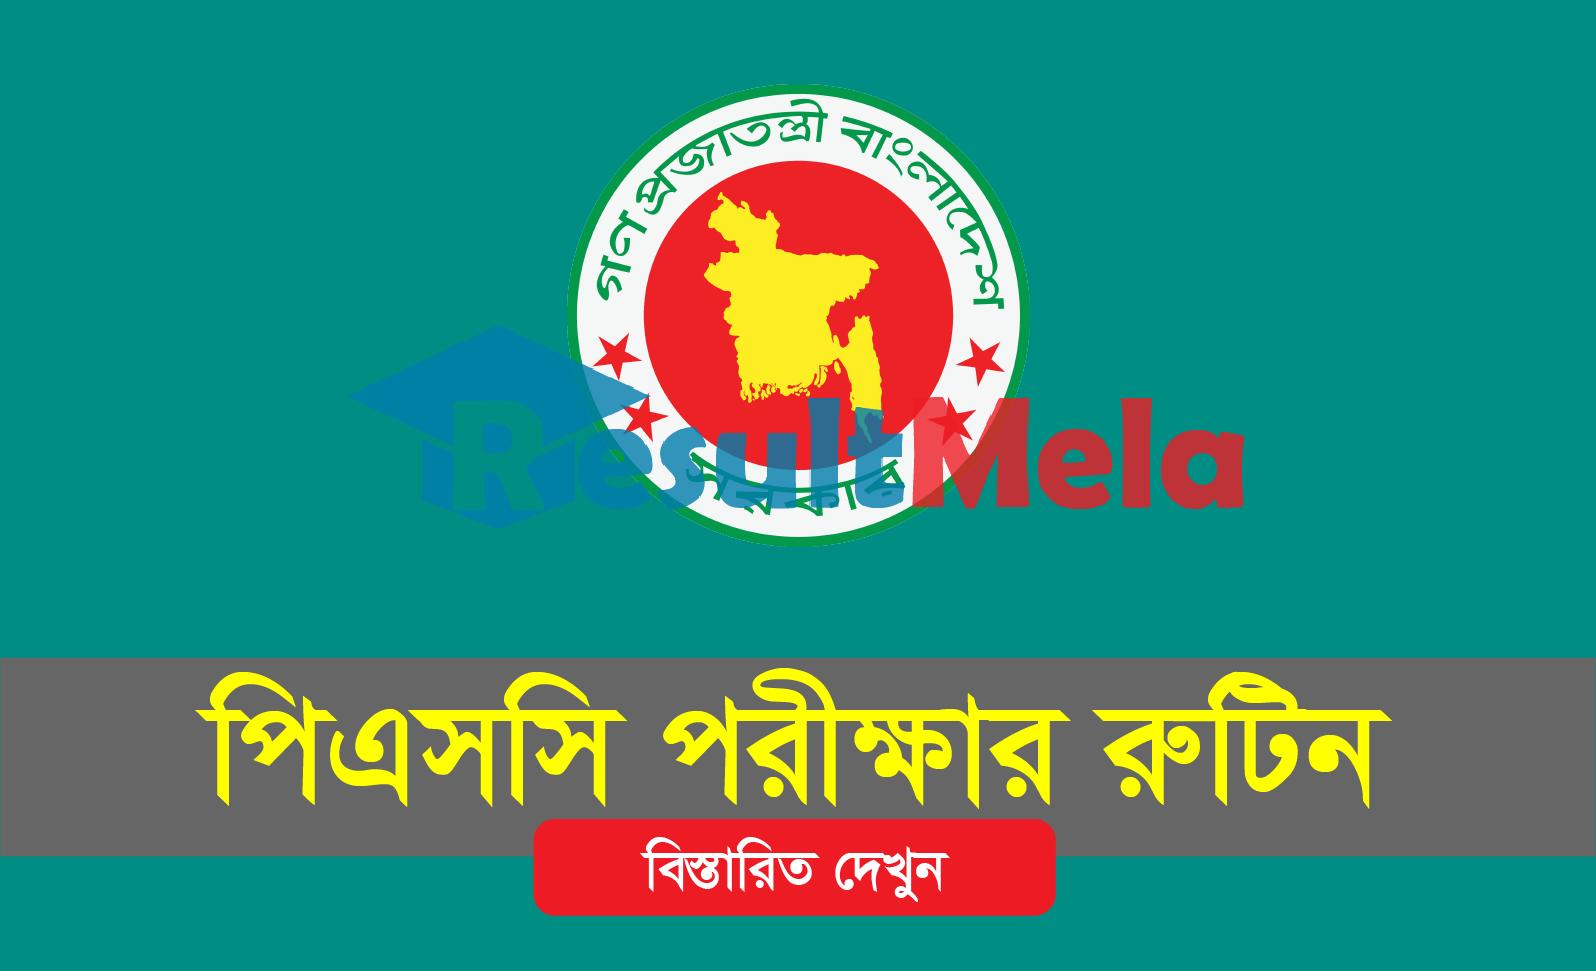 WWW DPE GOV BD RESULT 2016 - PSC Exam Routine 2016   www dpe gov bd